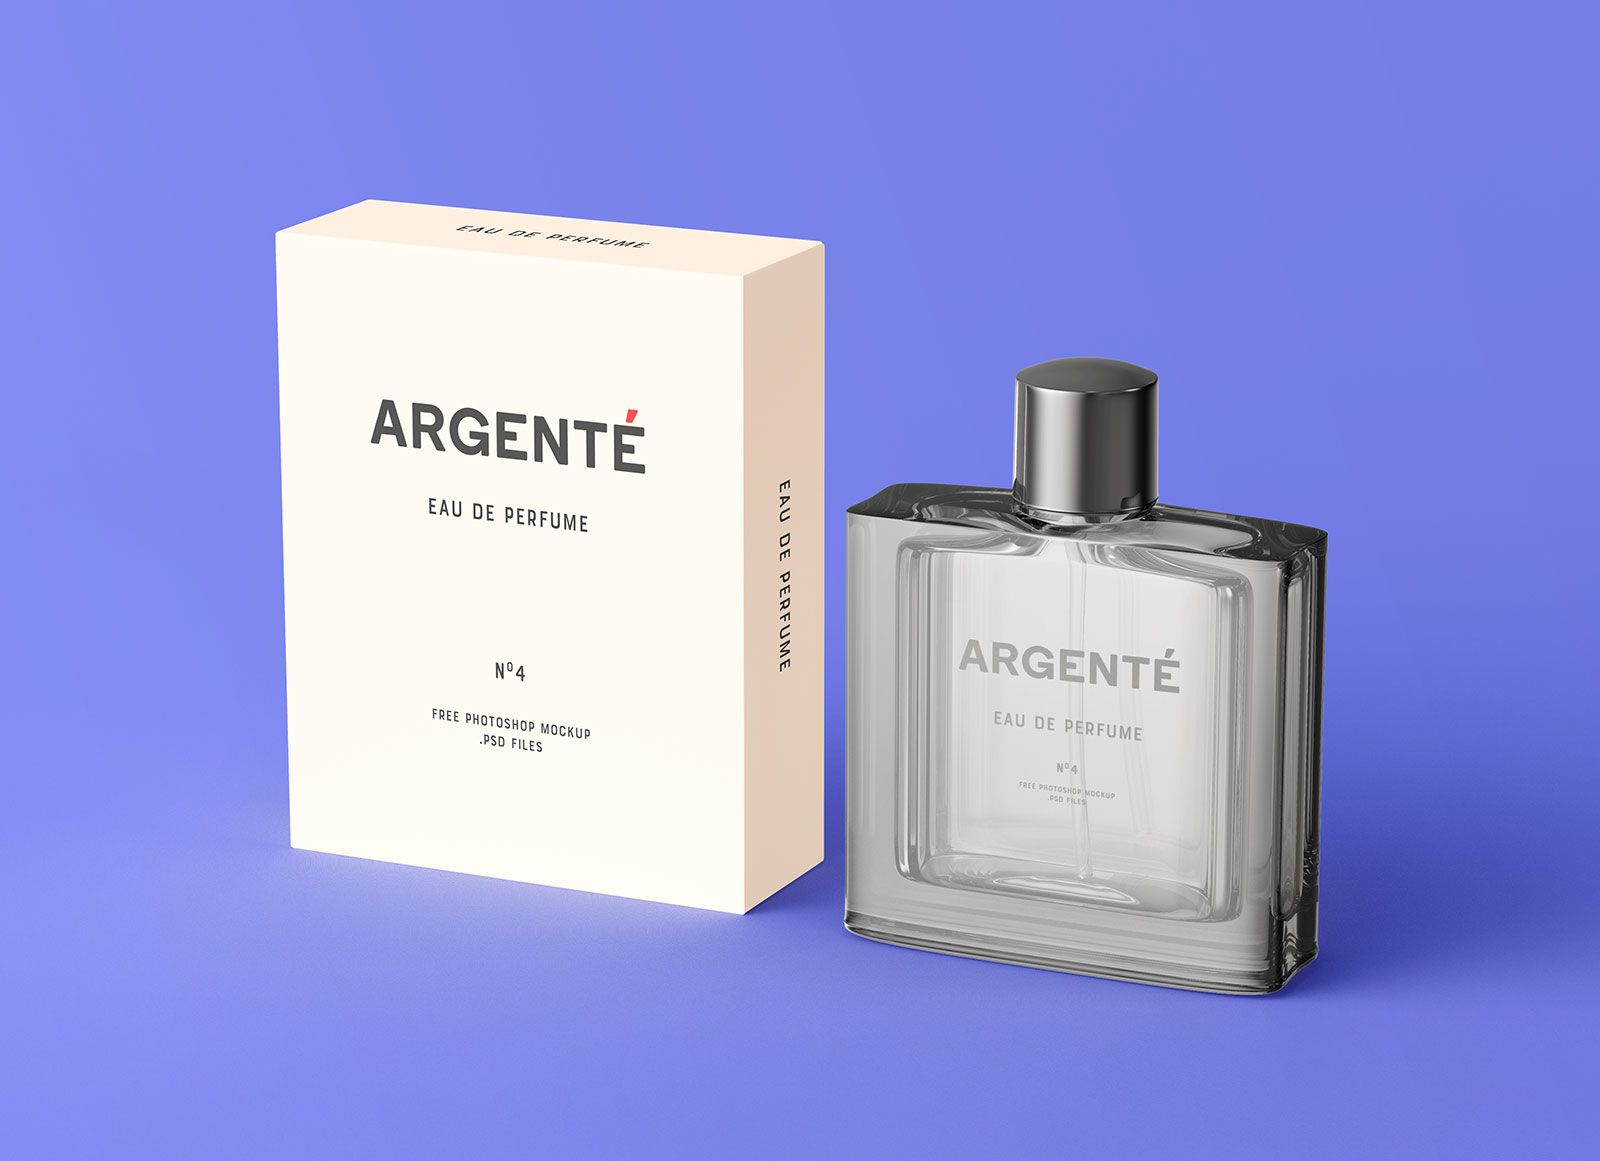 Download Free Perfume Bottle Box Packaging Mockup Psd Ver 2 Free Perfume Packaging Mockup Perfume Bottles